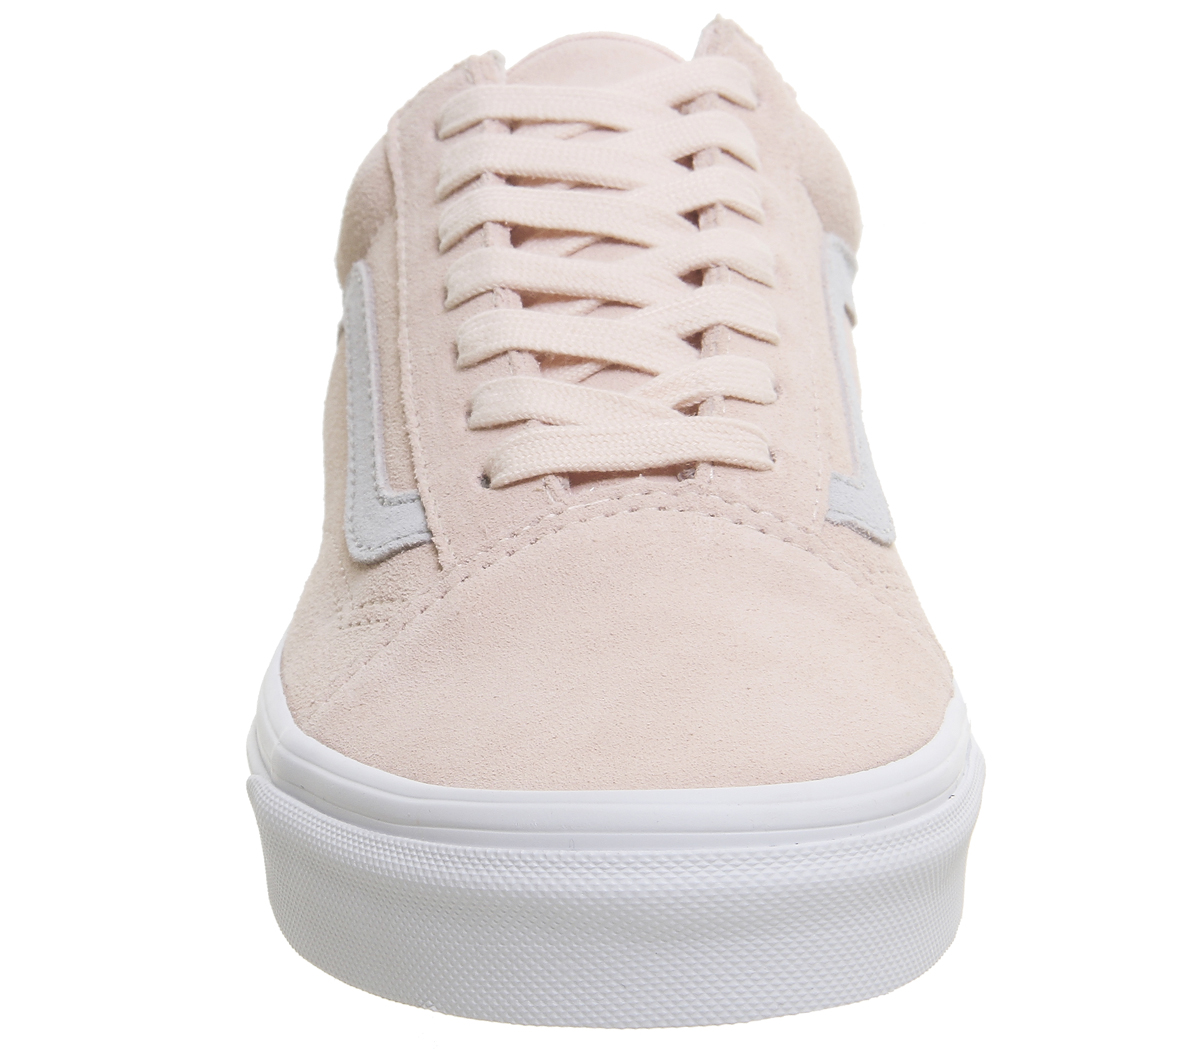 576de7b9e77548 Mens Vans Old Skool Trainers PALE PINK GREY EXCLUSIVE Trainers Shoes ...